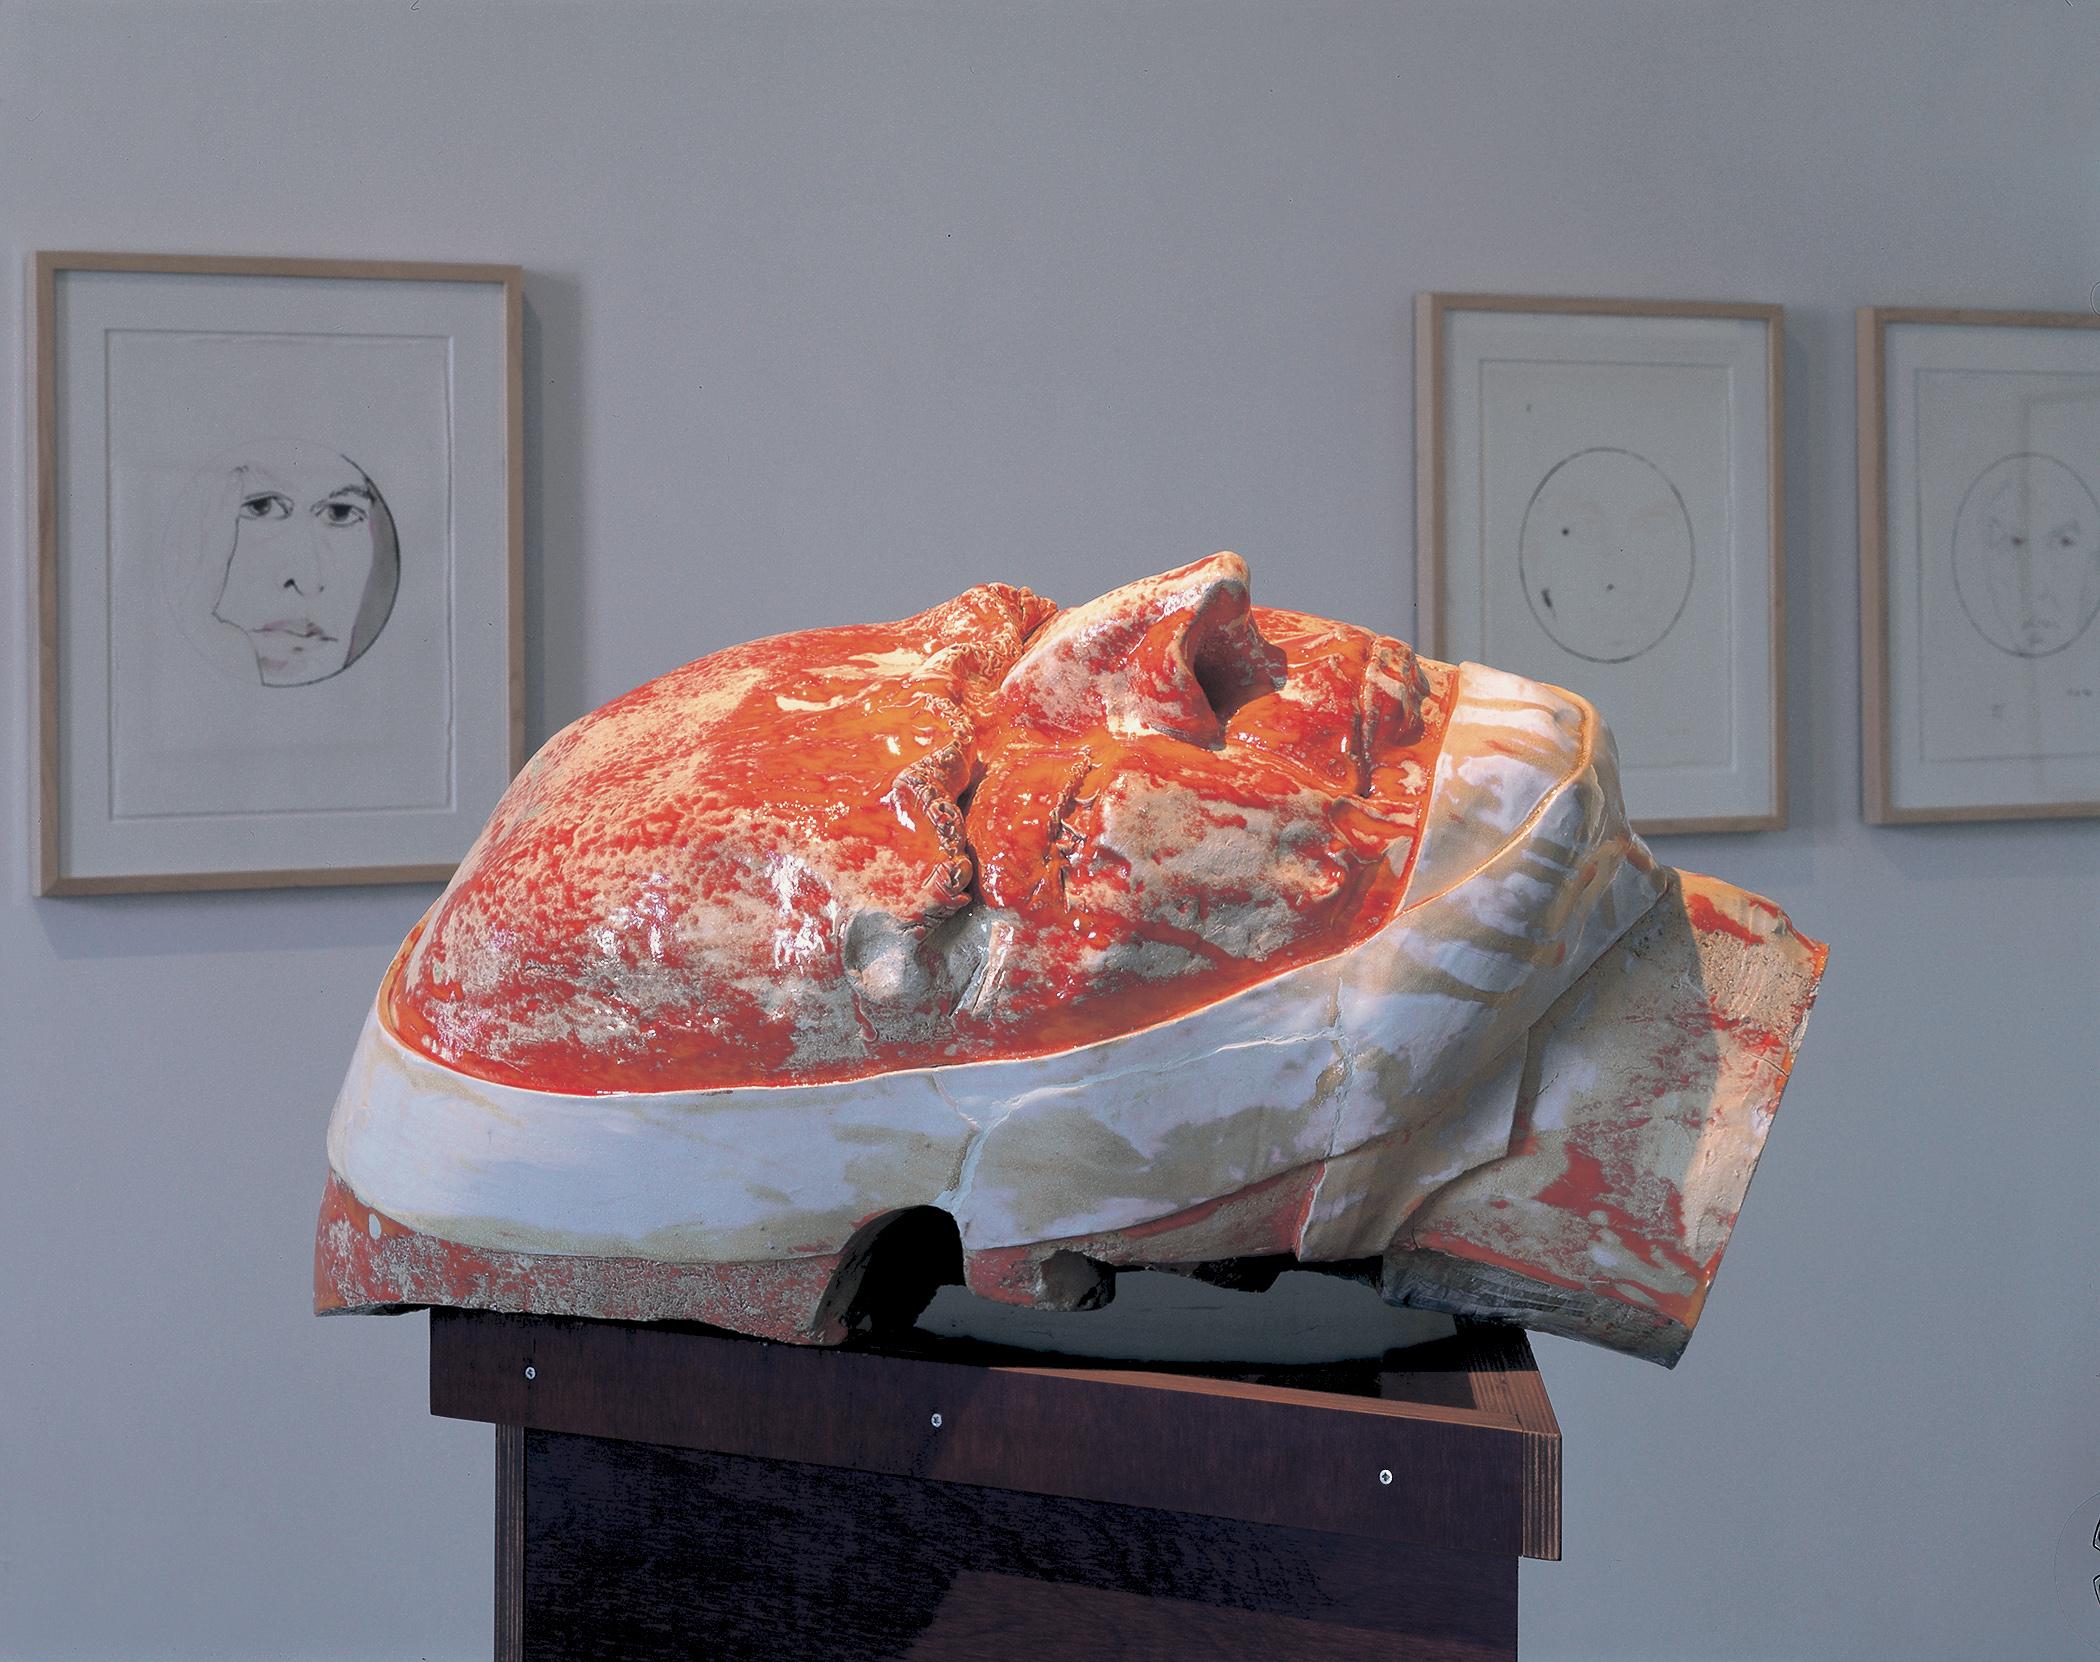 Thomas Schütte, »Roter Kopf«, 1997, © VG Bild-Kunst, Bonn 2020, Foto: Nic Tenwiggenhorn